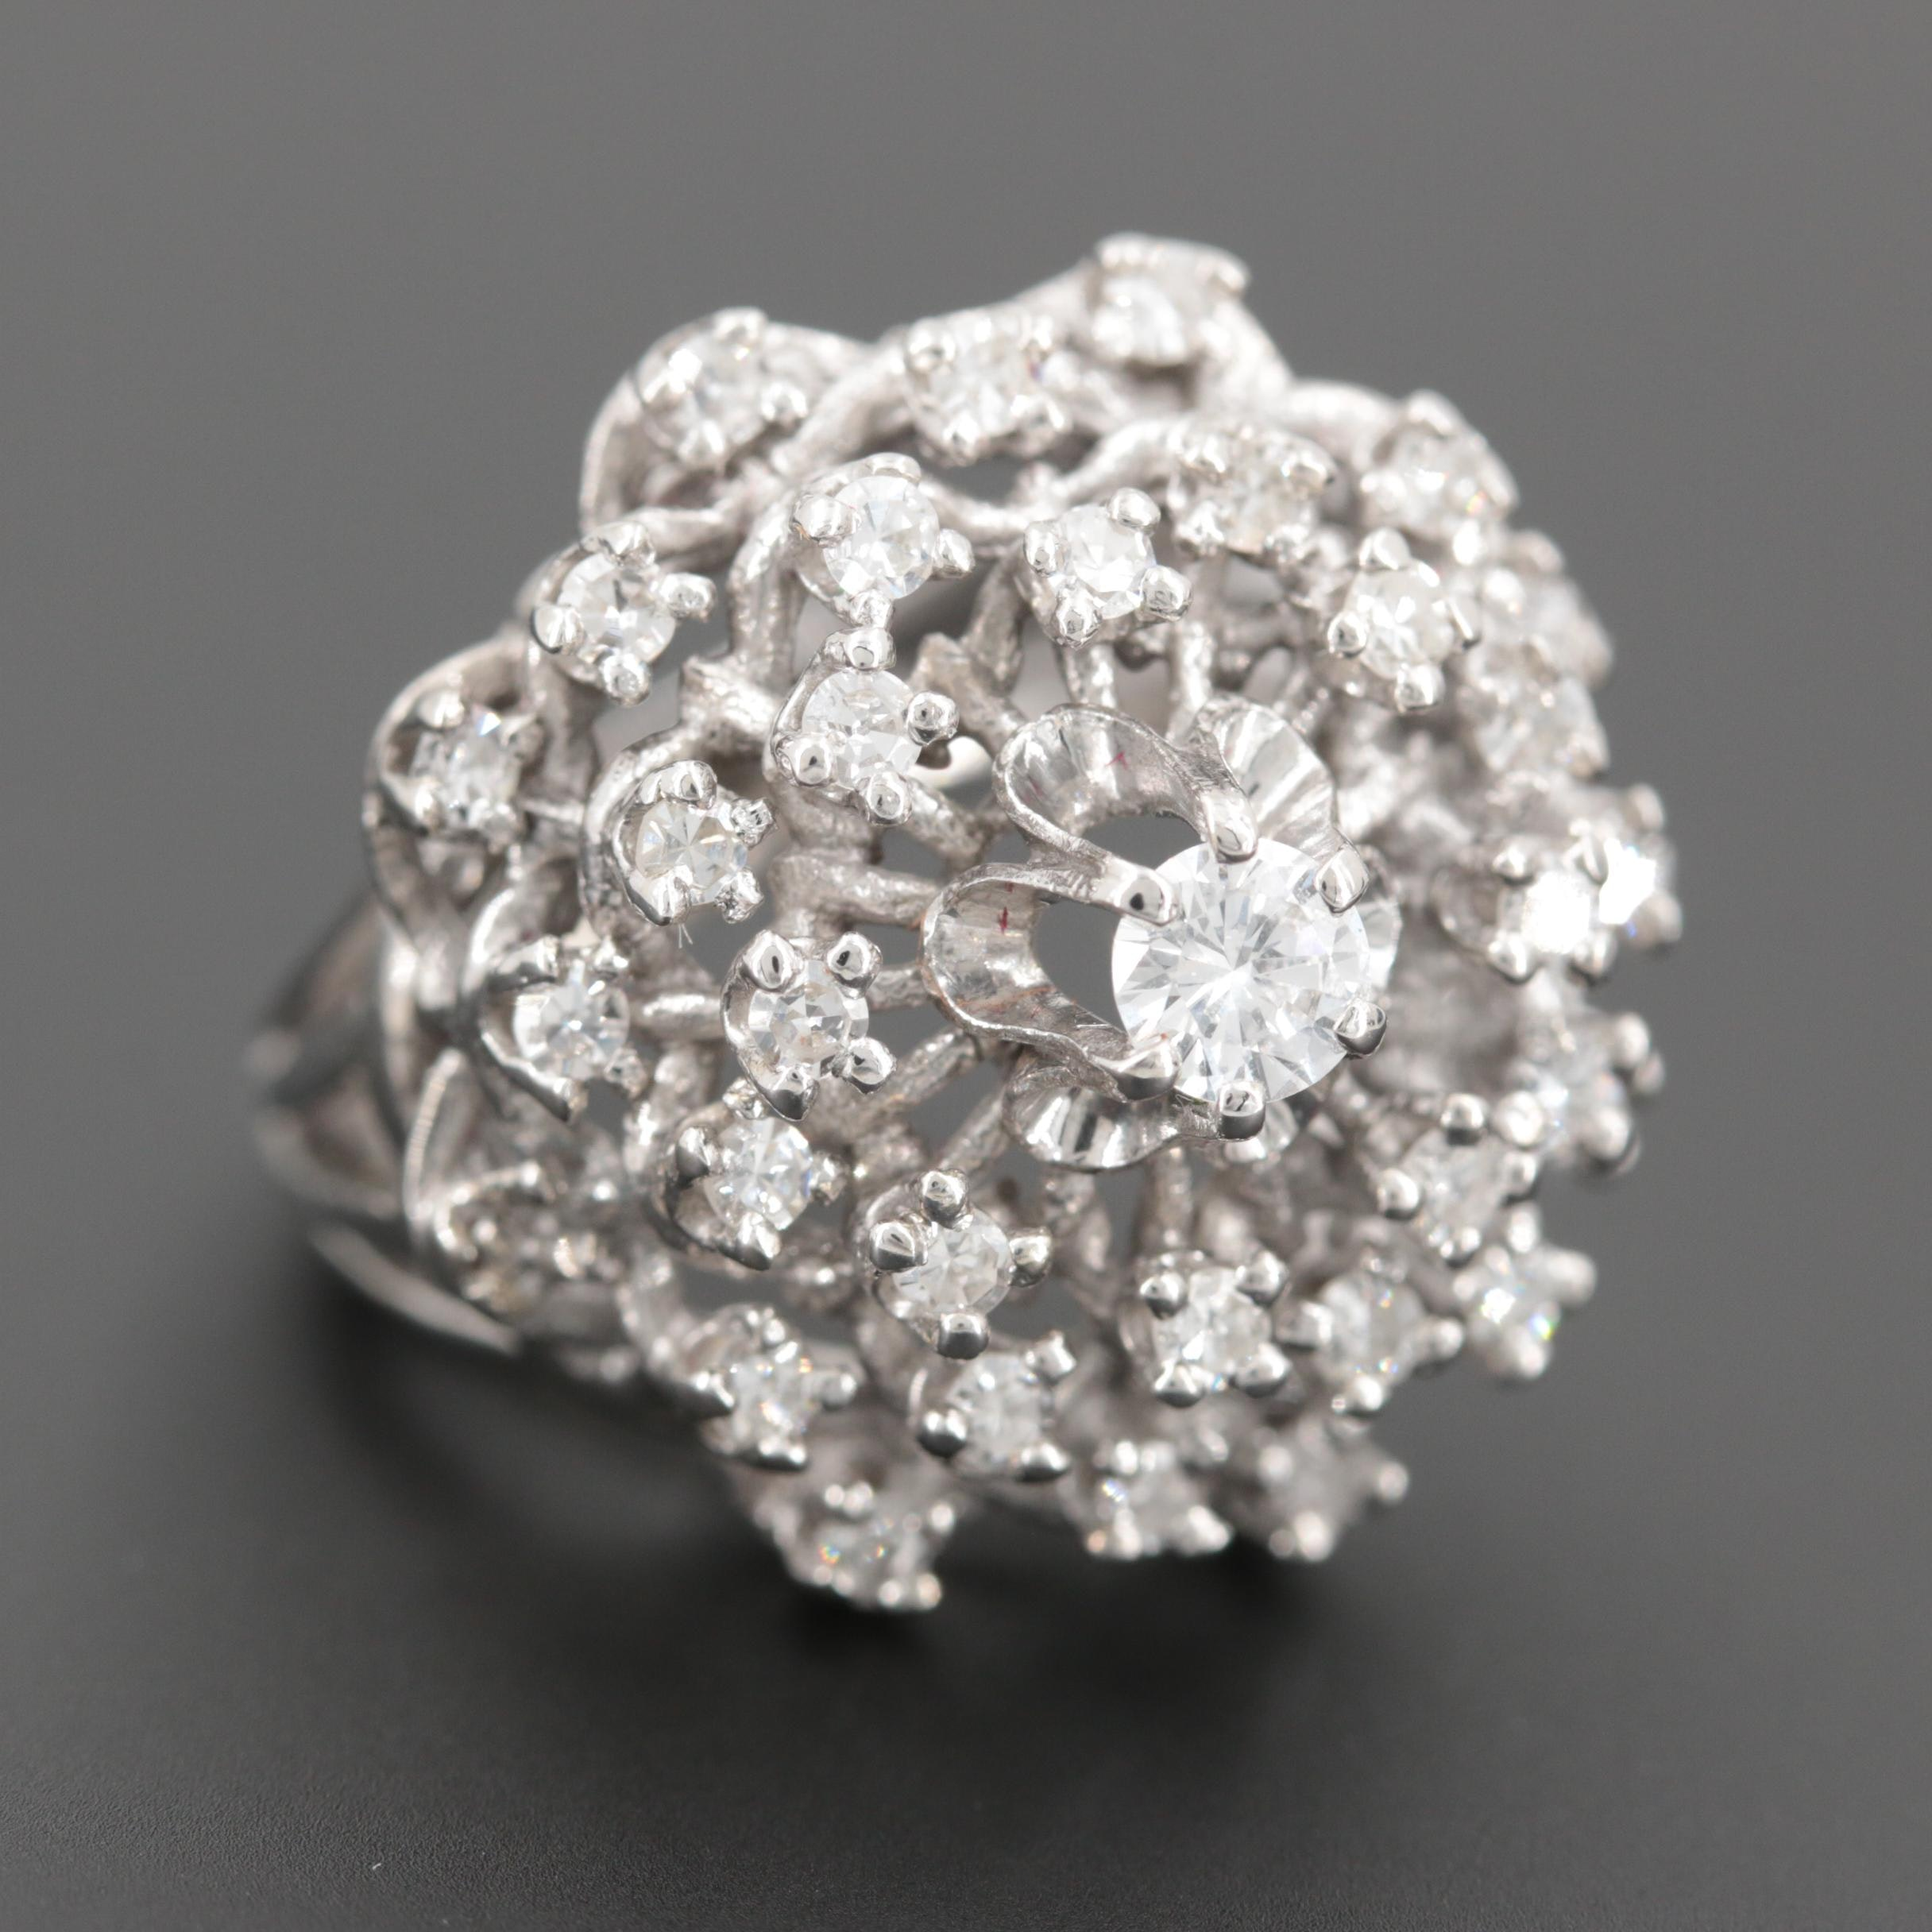 14K White Gold 1.21 CTW Diamond Ring